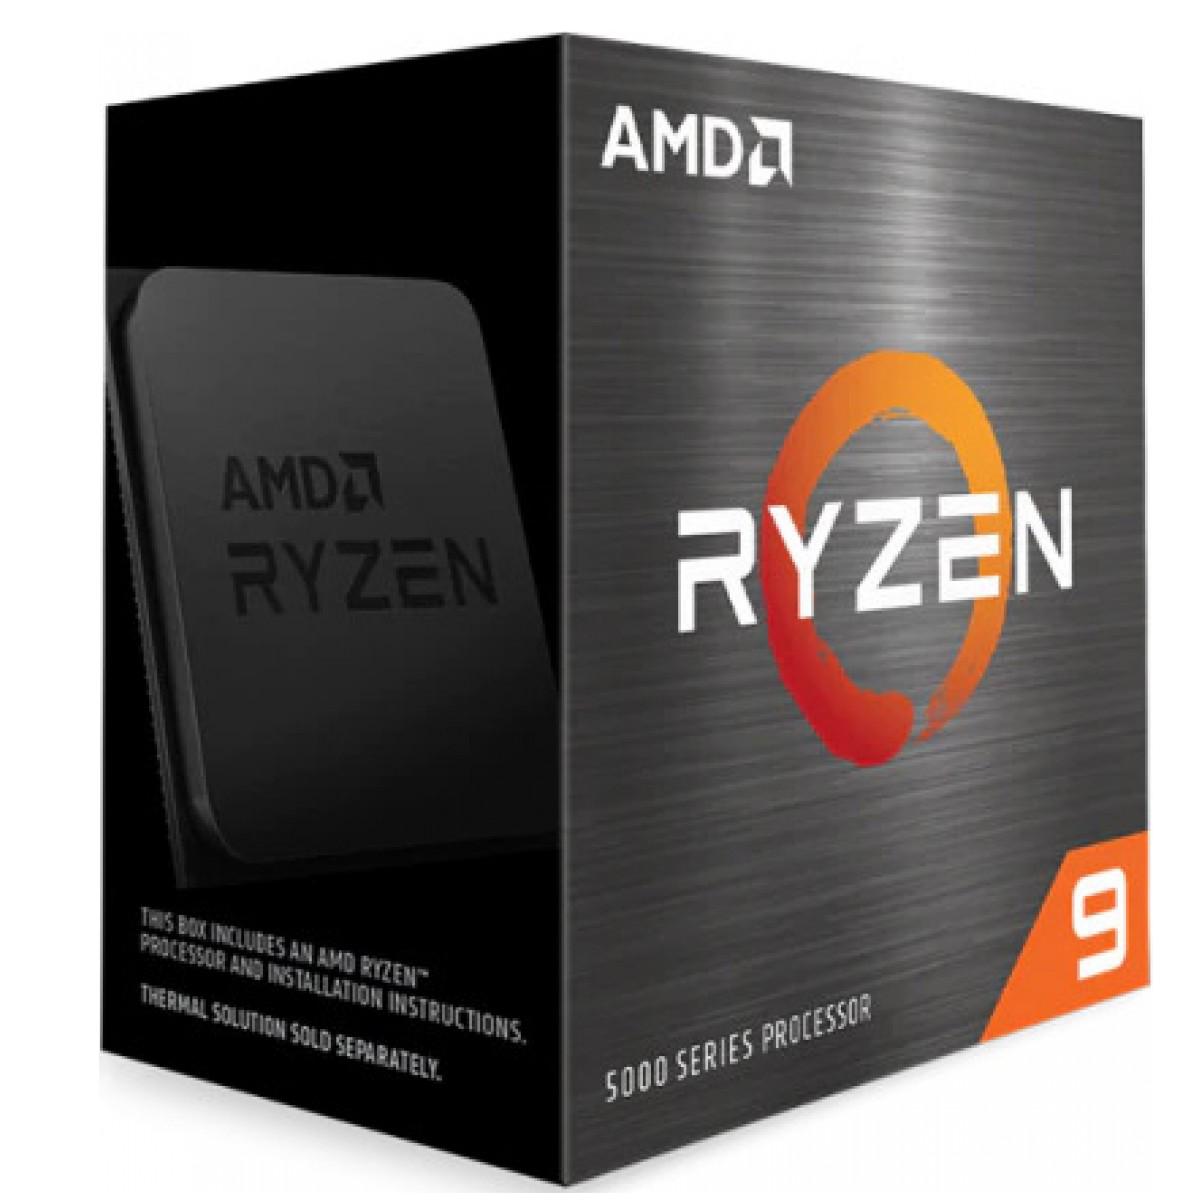 Kit Upgrade Sapphire Radeon Nitro+ RX 6700 XT + AMD Ryzen 9 5900X + Brinde Jogo Dirt 5